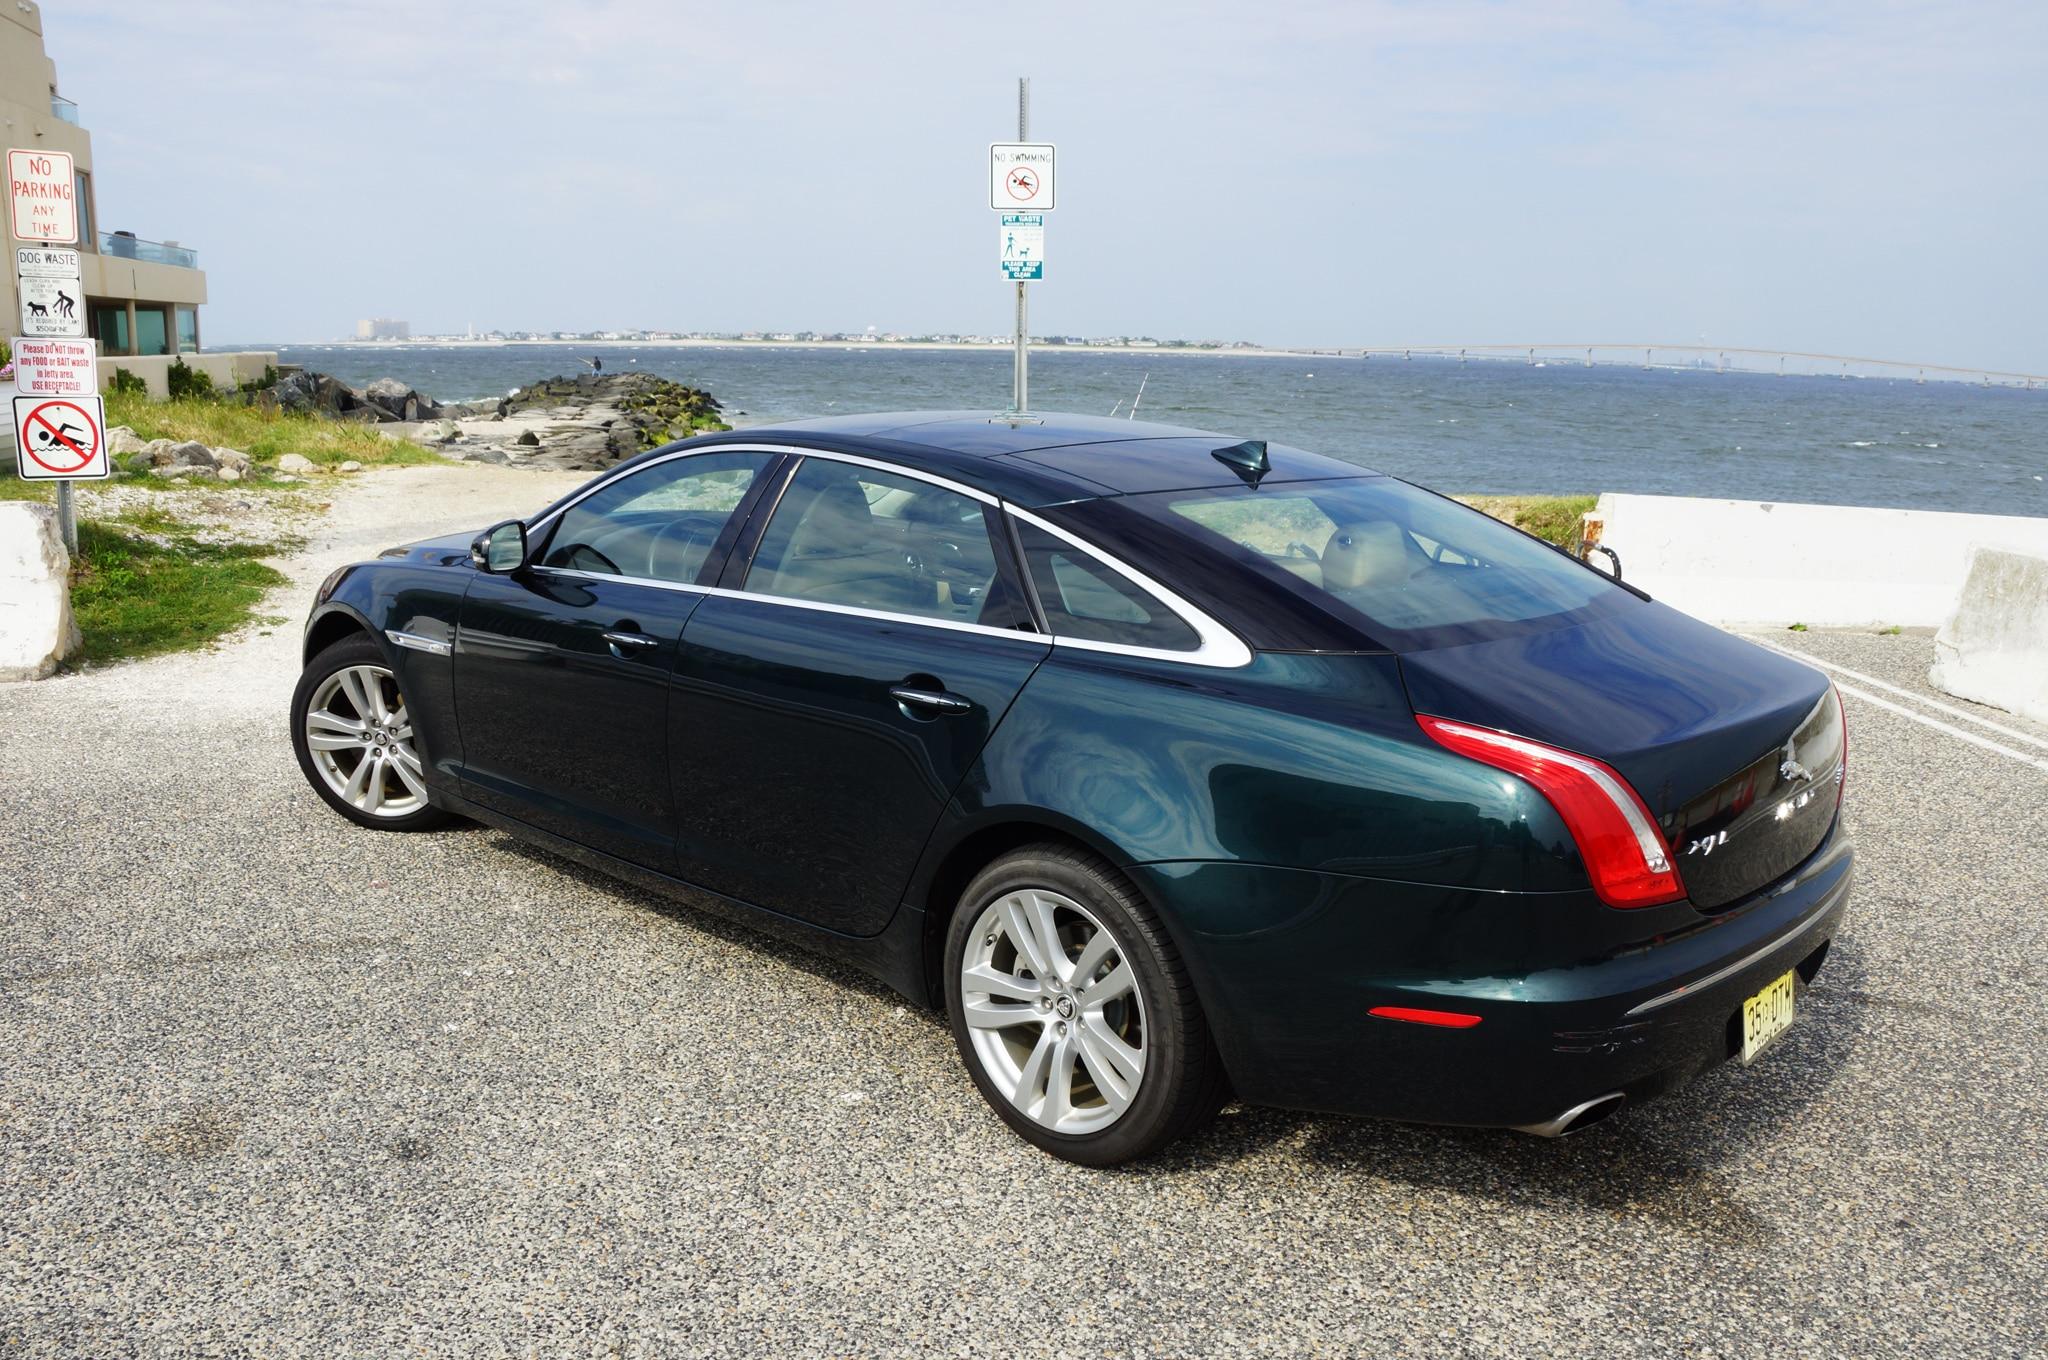 price jaguar united on states portfolio in dublin jamesedition xjl sale xj oh cars for